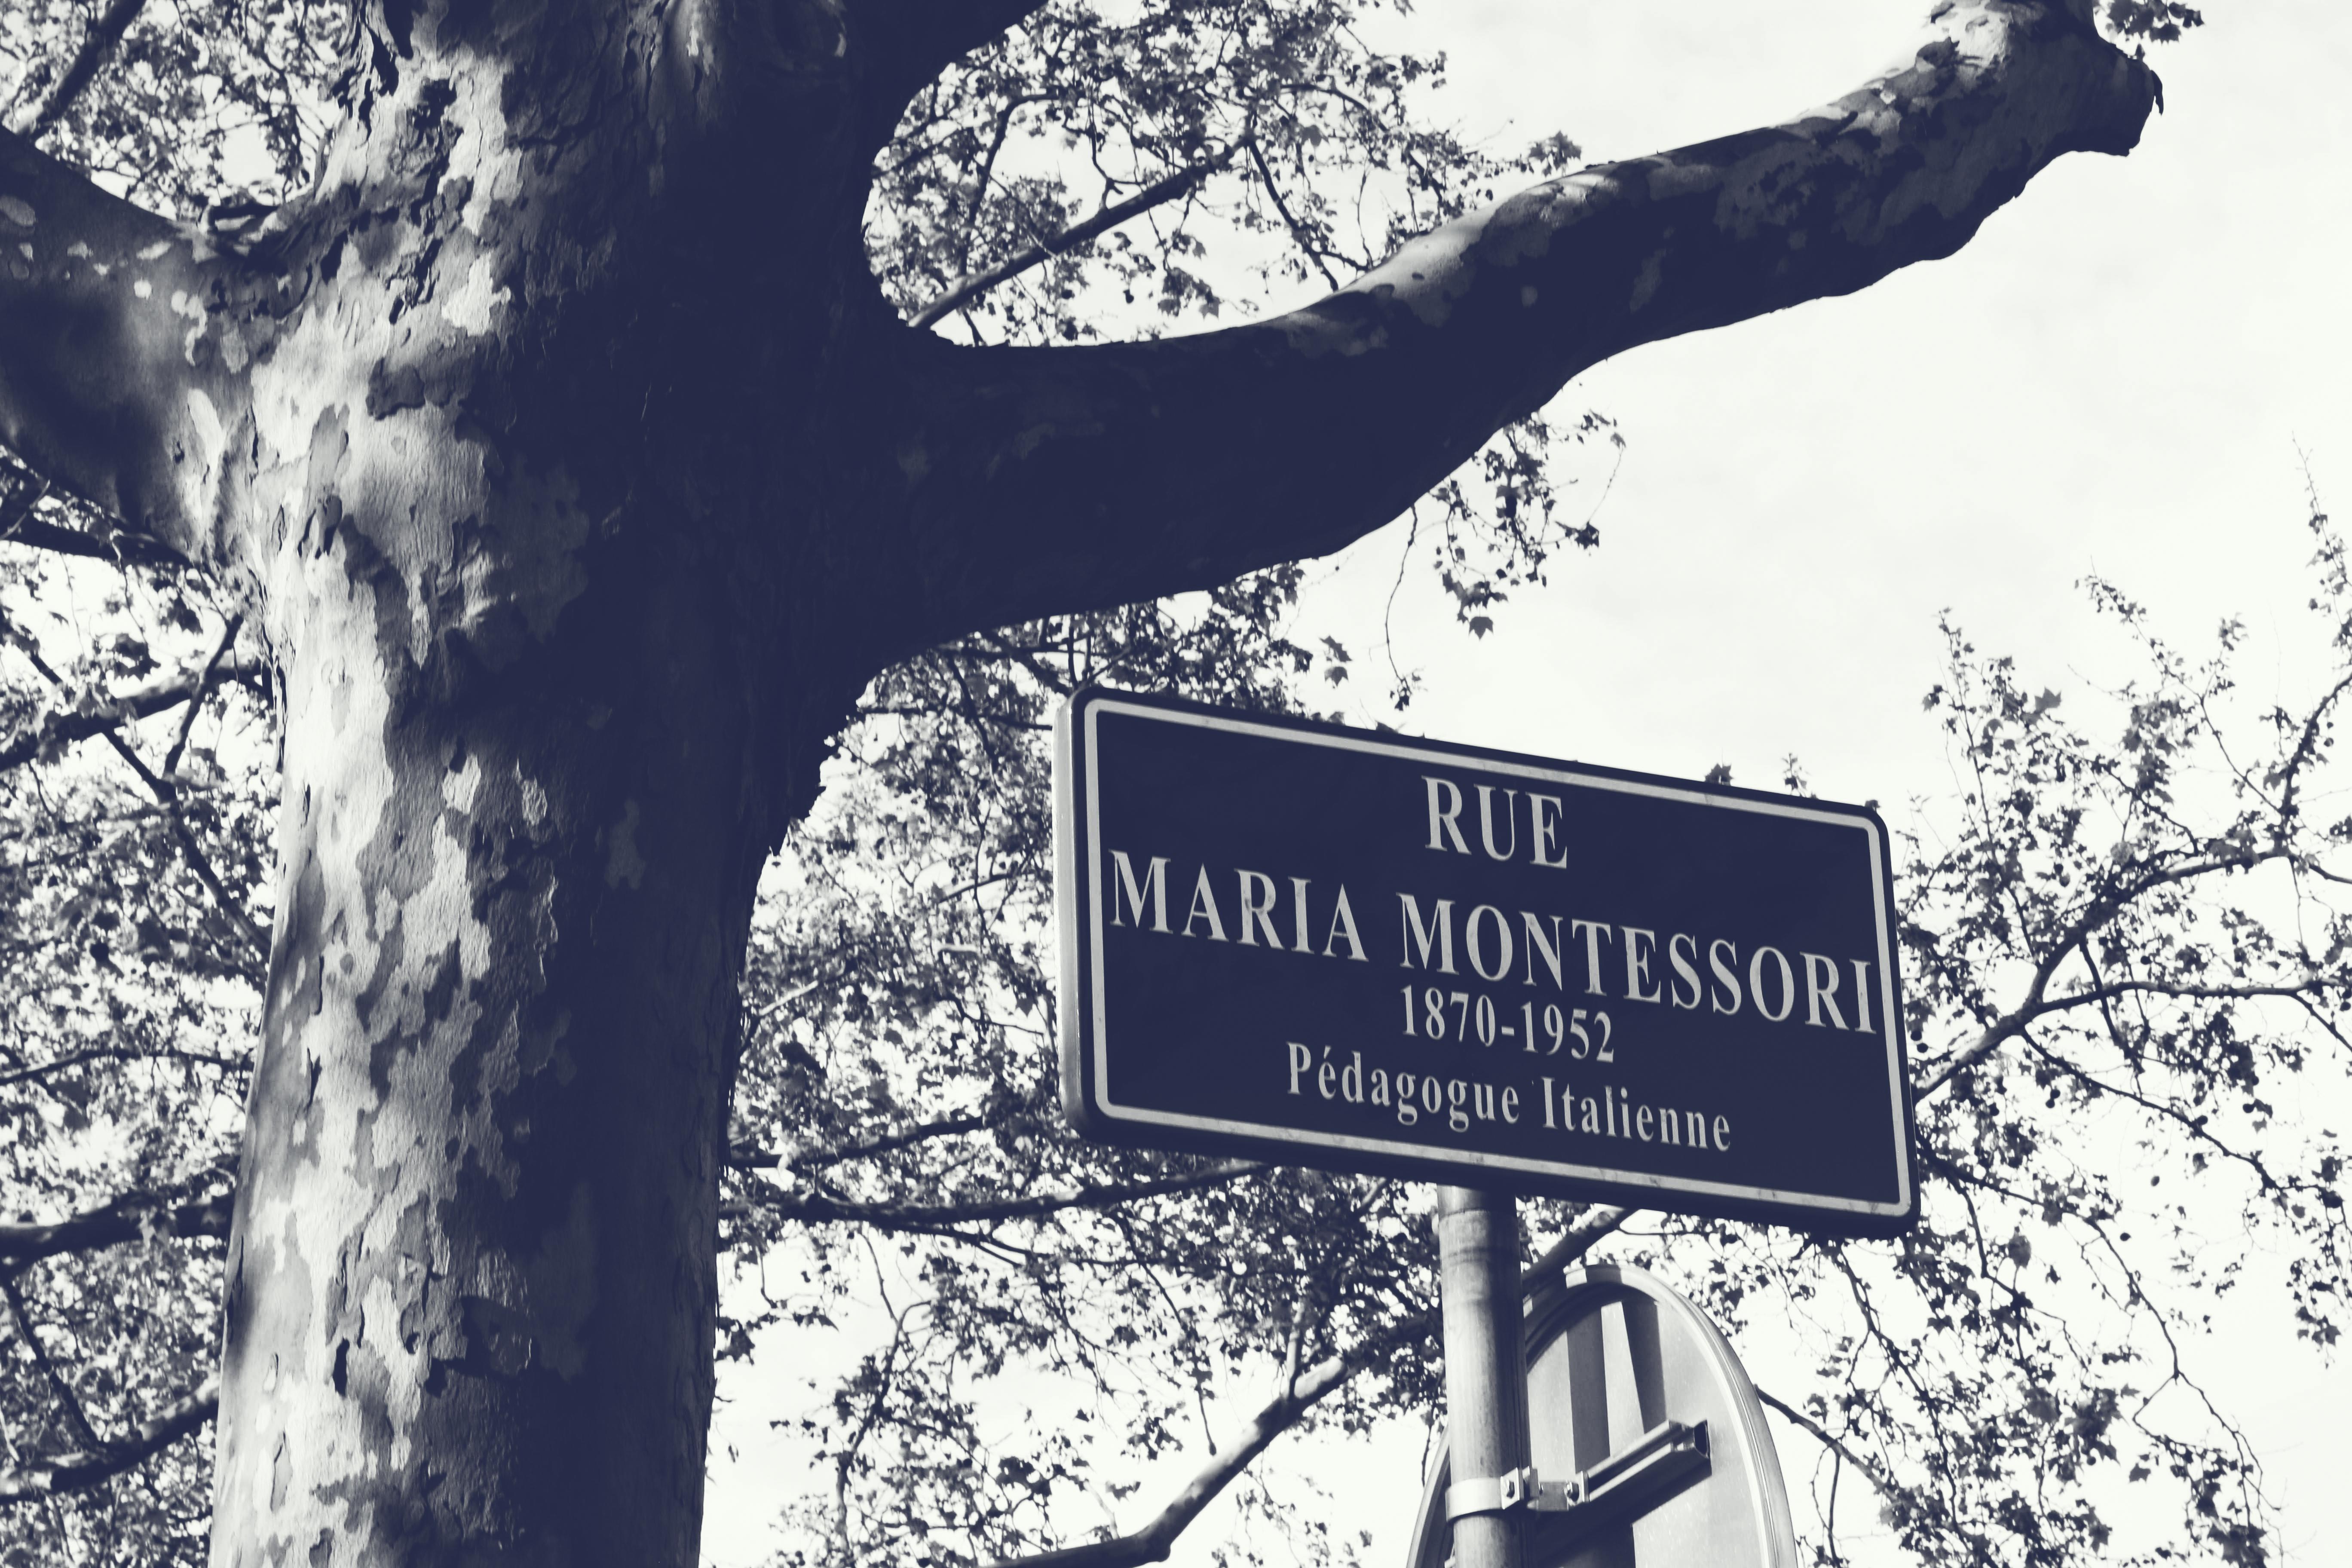 Le saviez-vous : la rue Maria Montessori